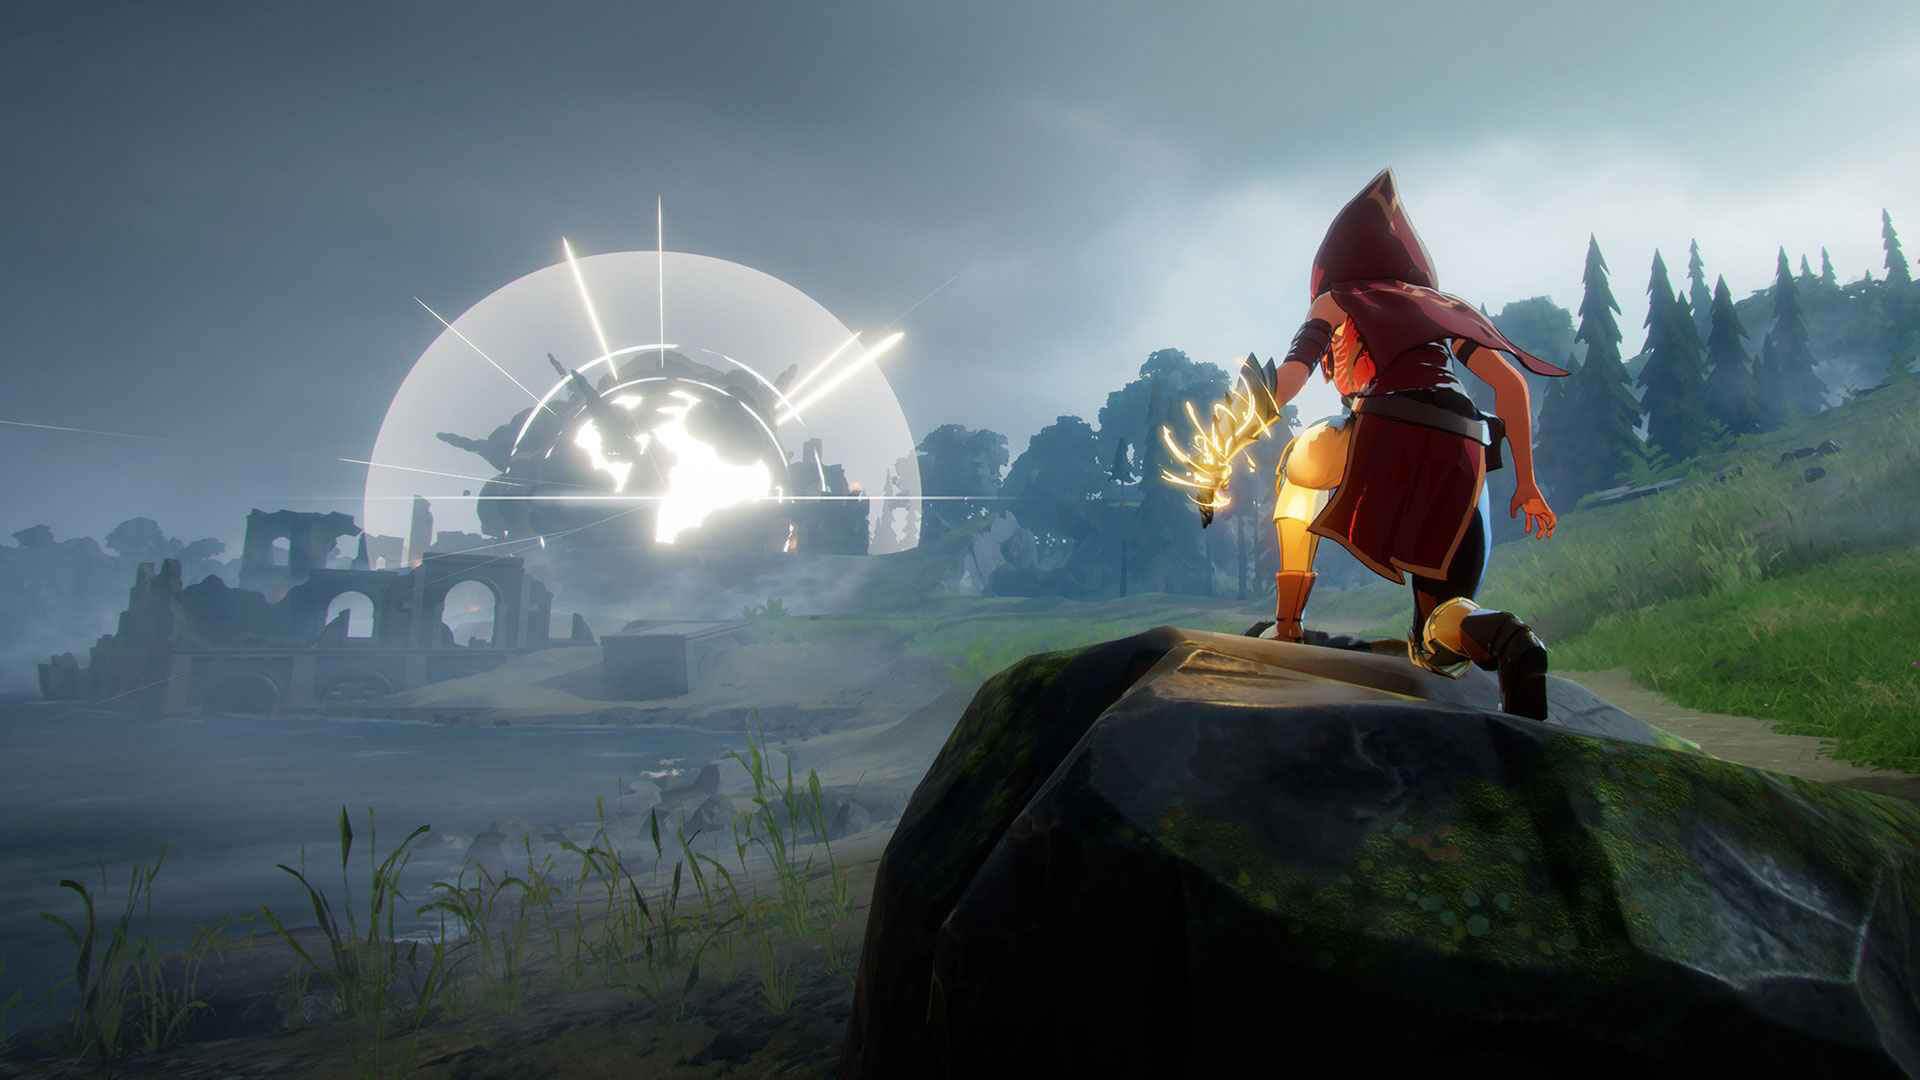 Spellbreak game image